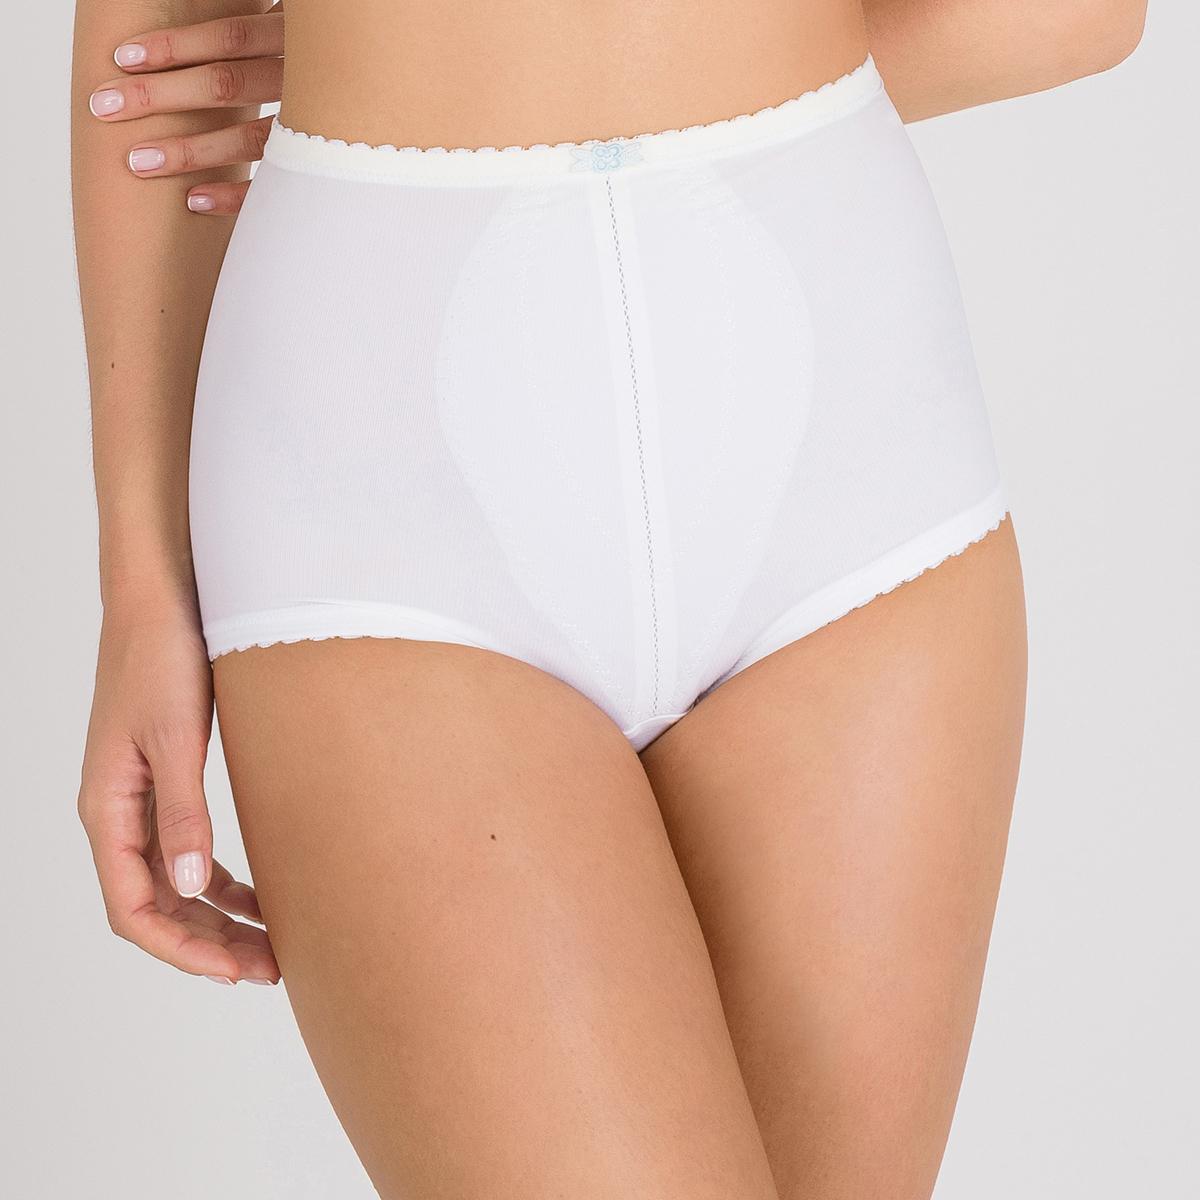 Culotte gainante serre-taille blanche  – ICUG, , PLAYTEX